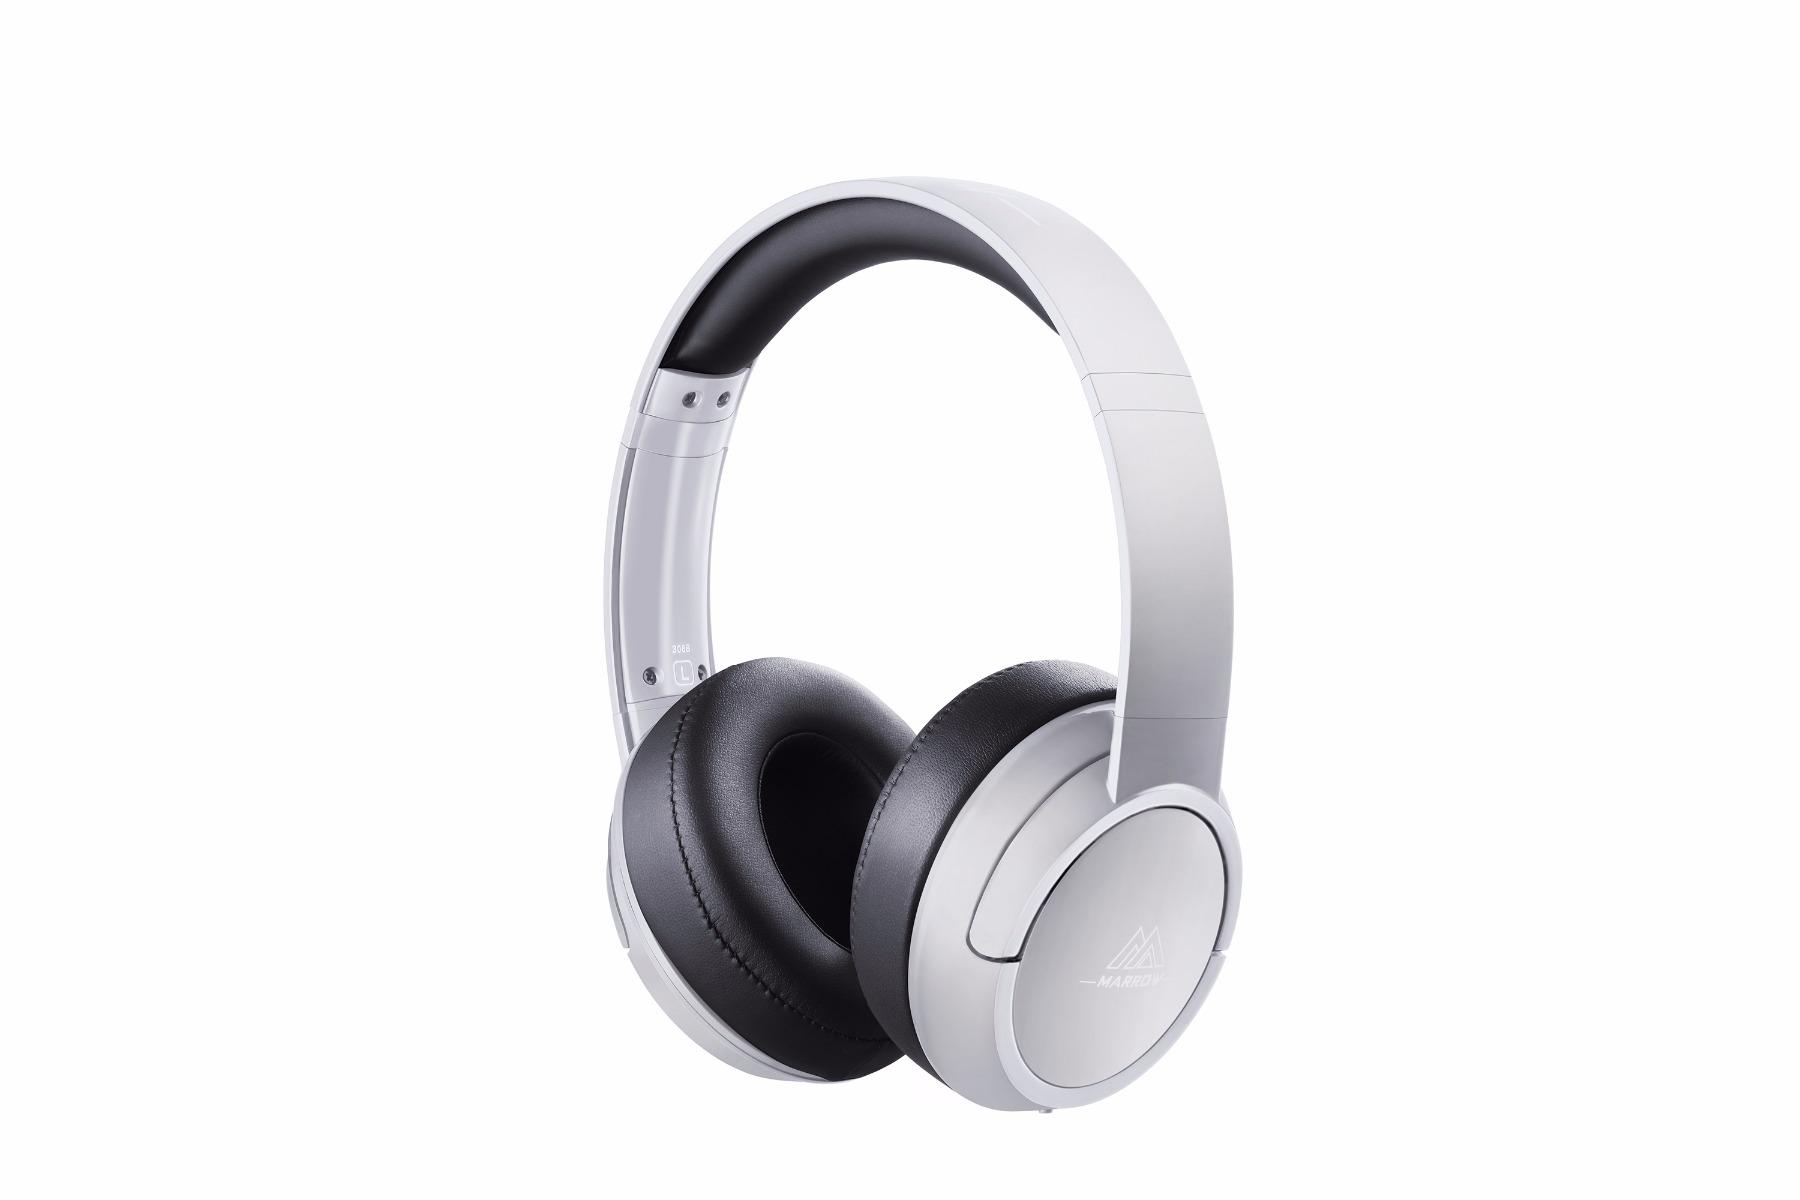 MARROW 306B Music Bluetooth Headphones